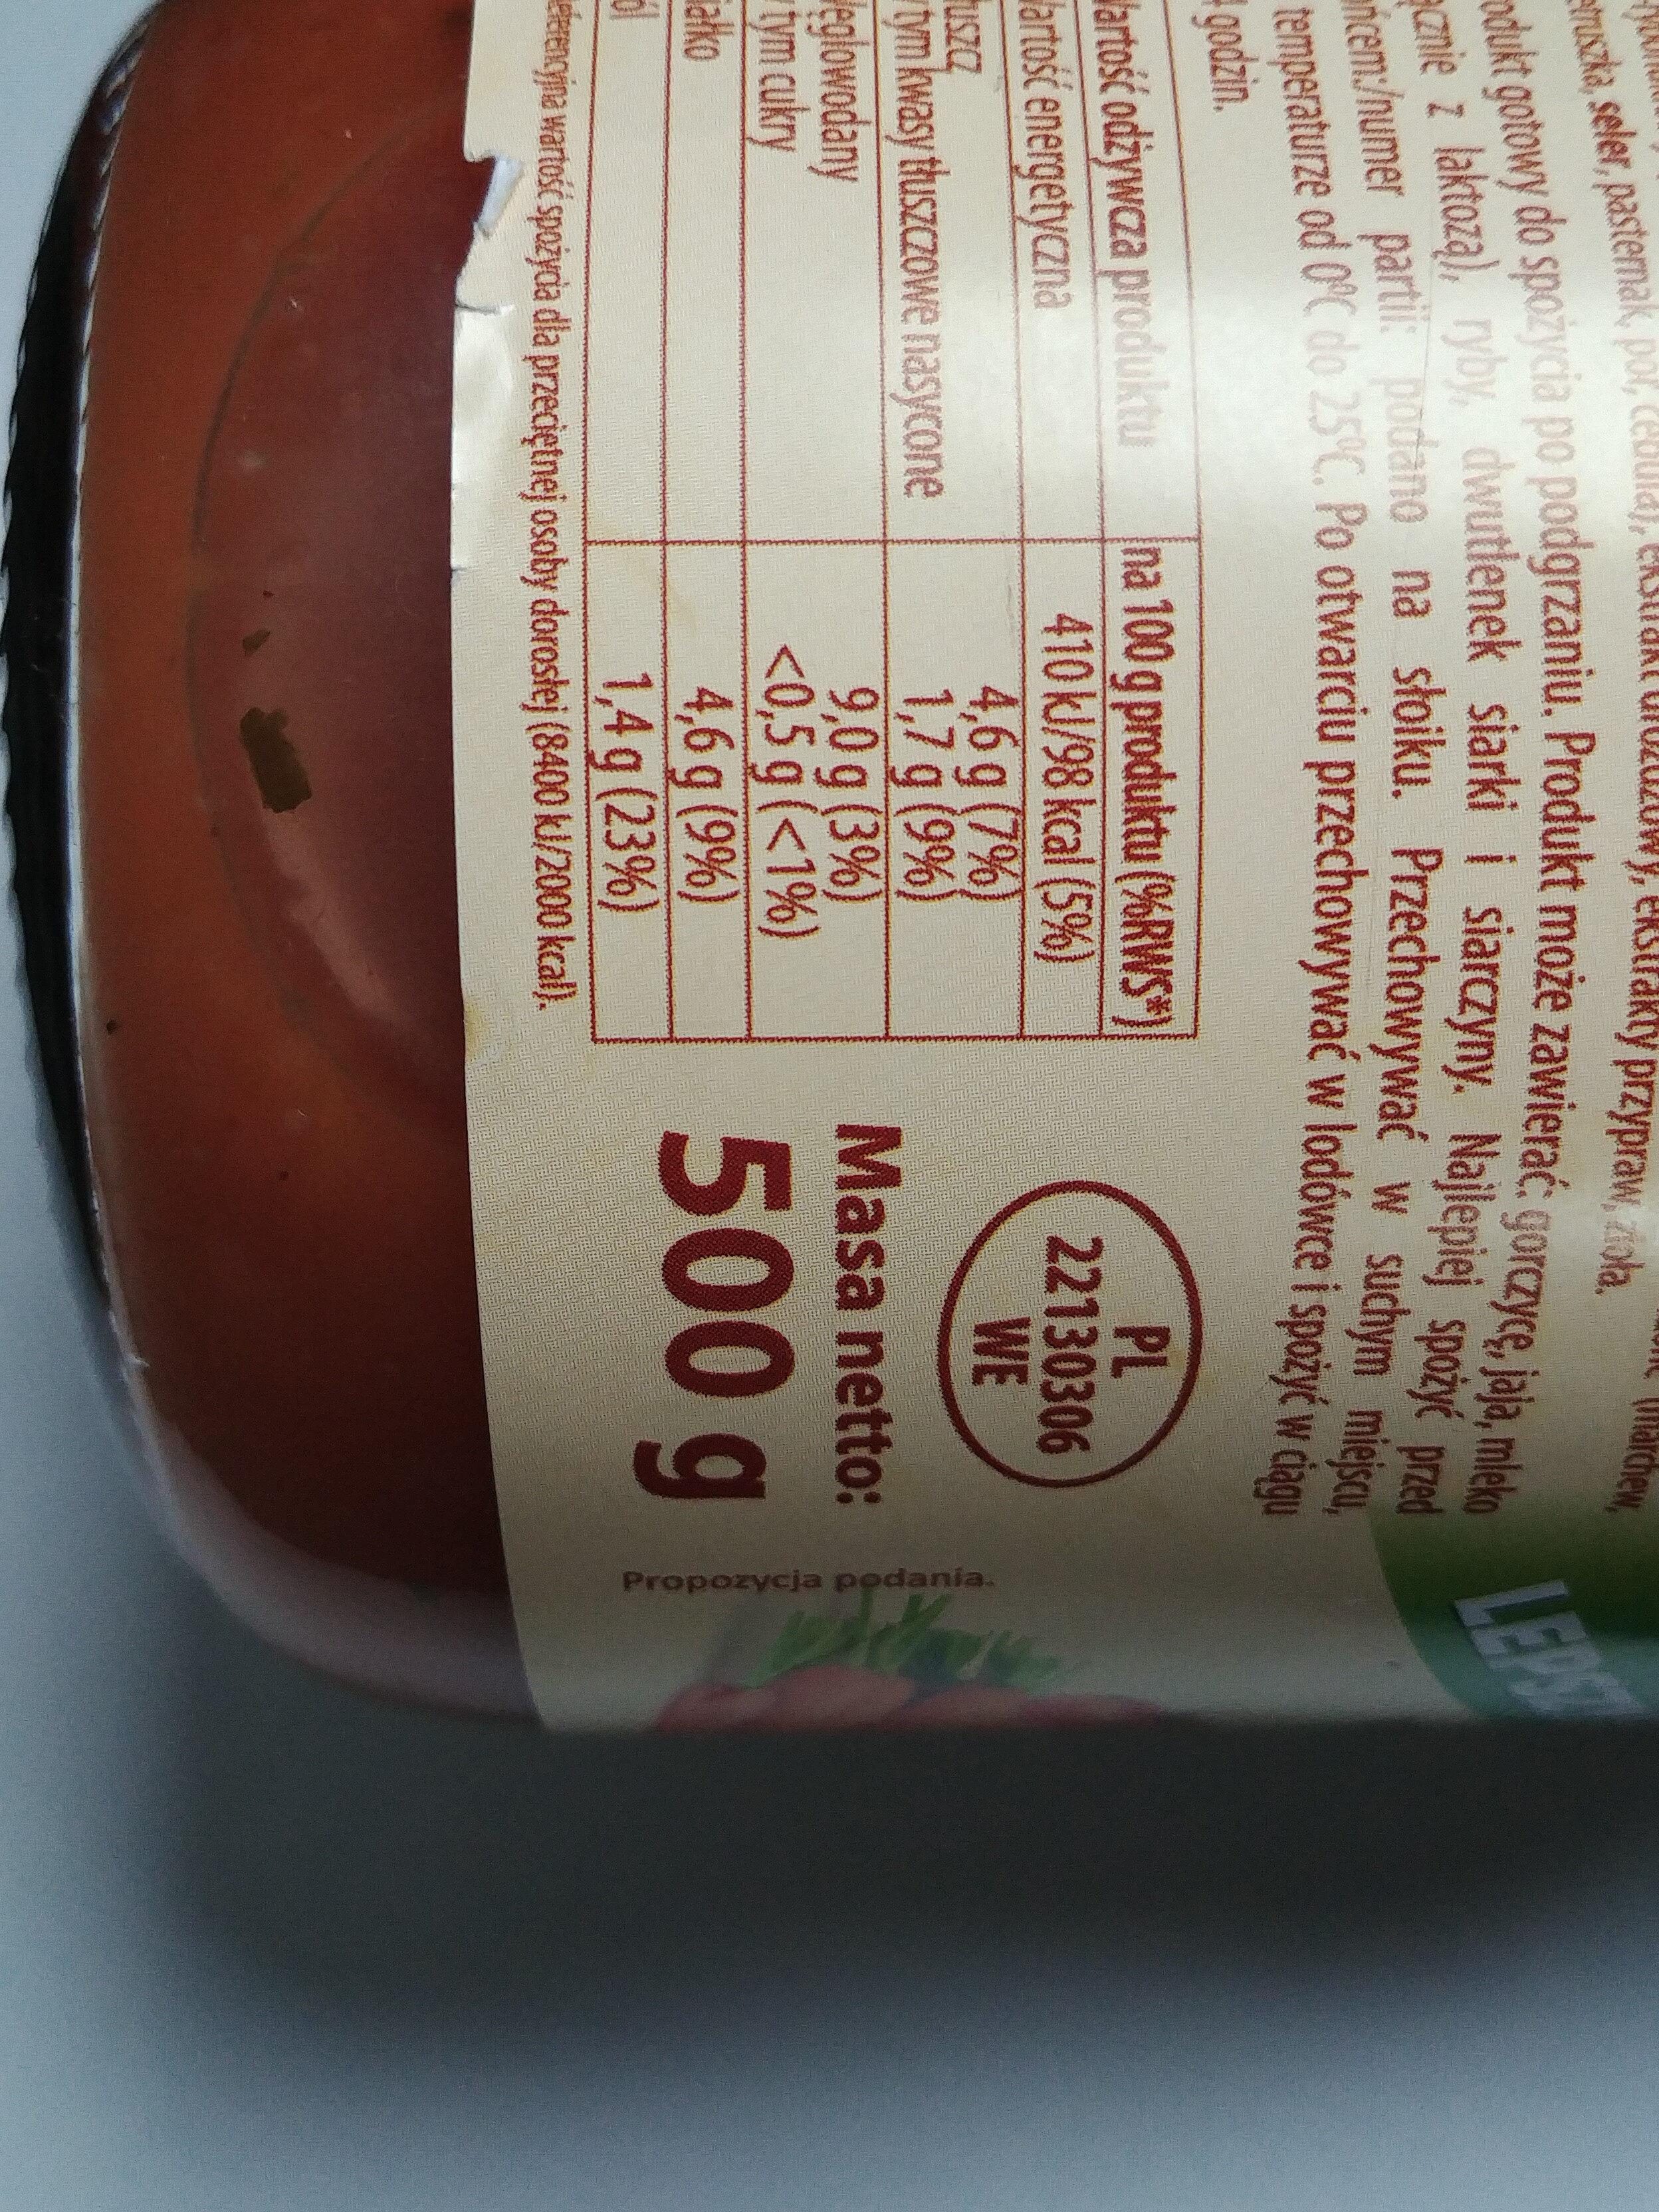 Pulpety drobiowe w sosie pomidorowym - Informations nutritionnelles - pl